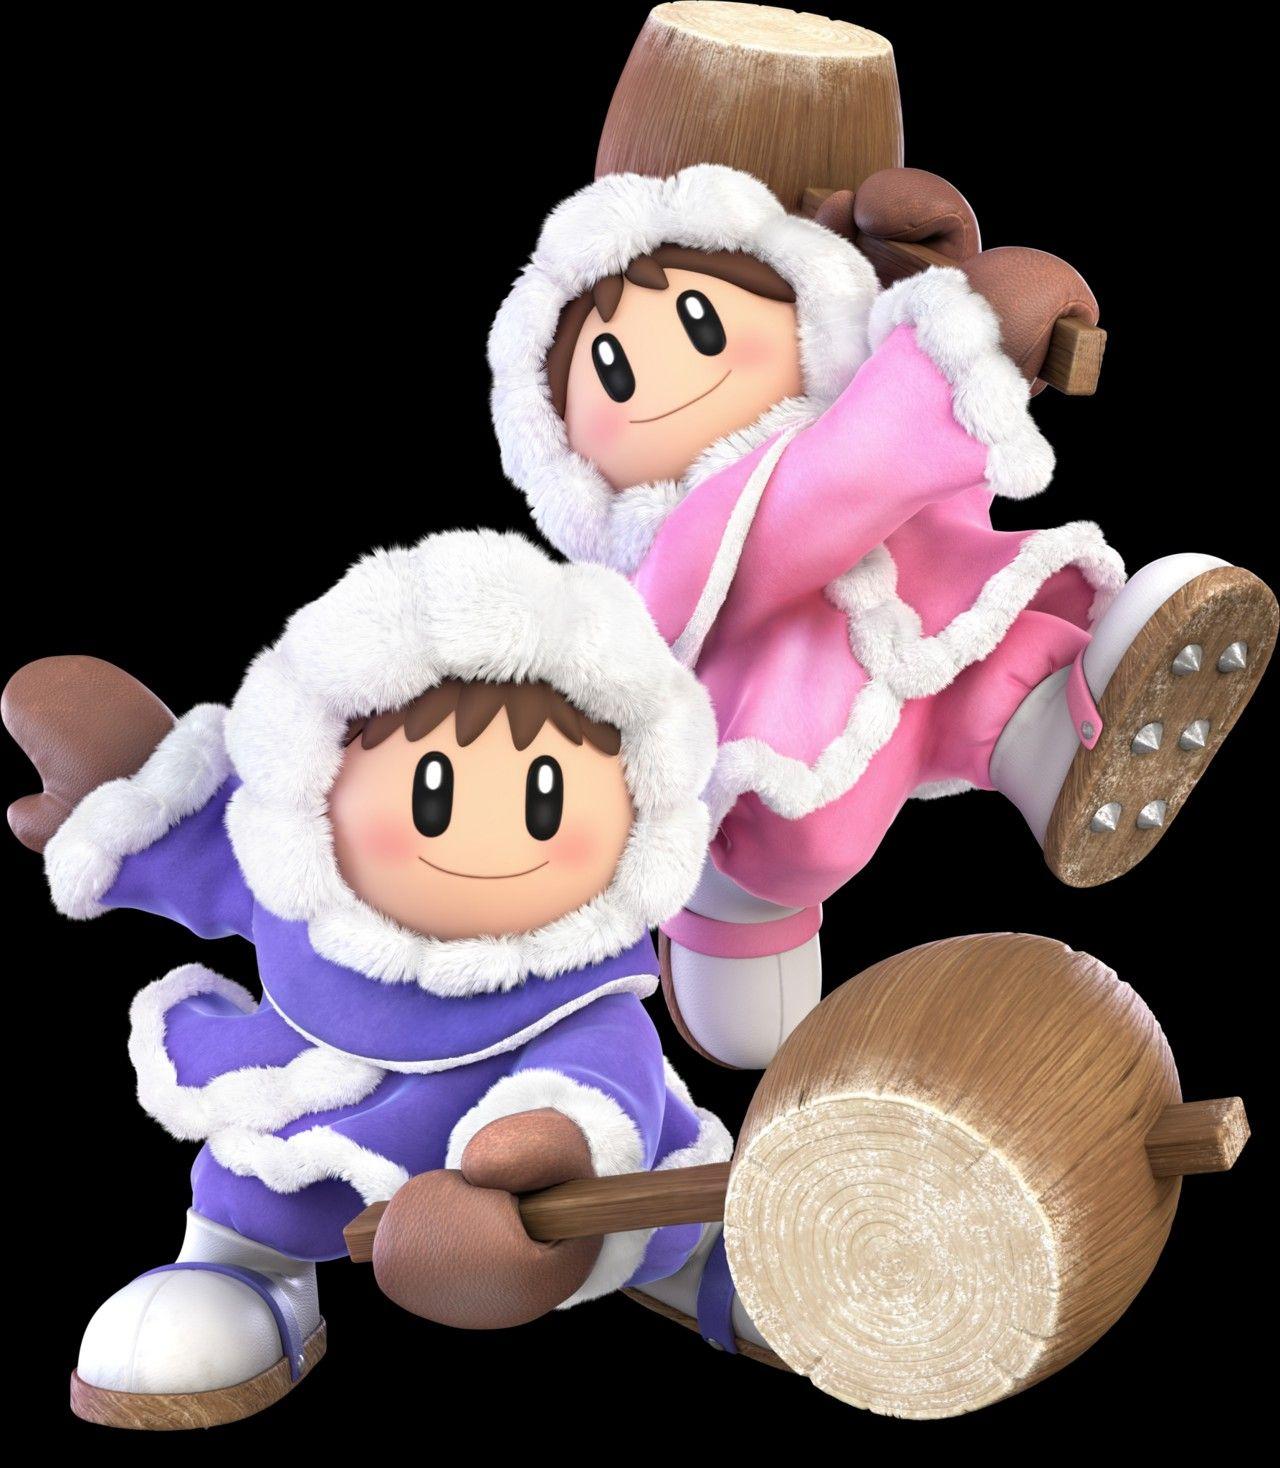 Ice Climbers Ice Climber Super Smash Bros Smash Bros